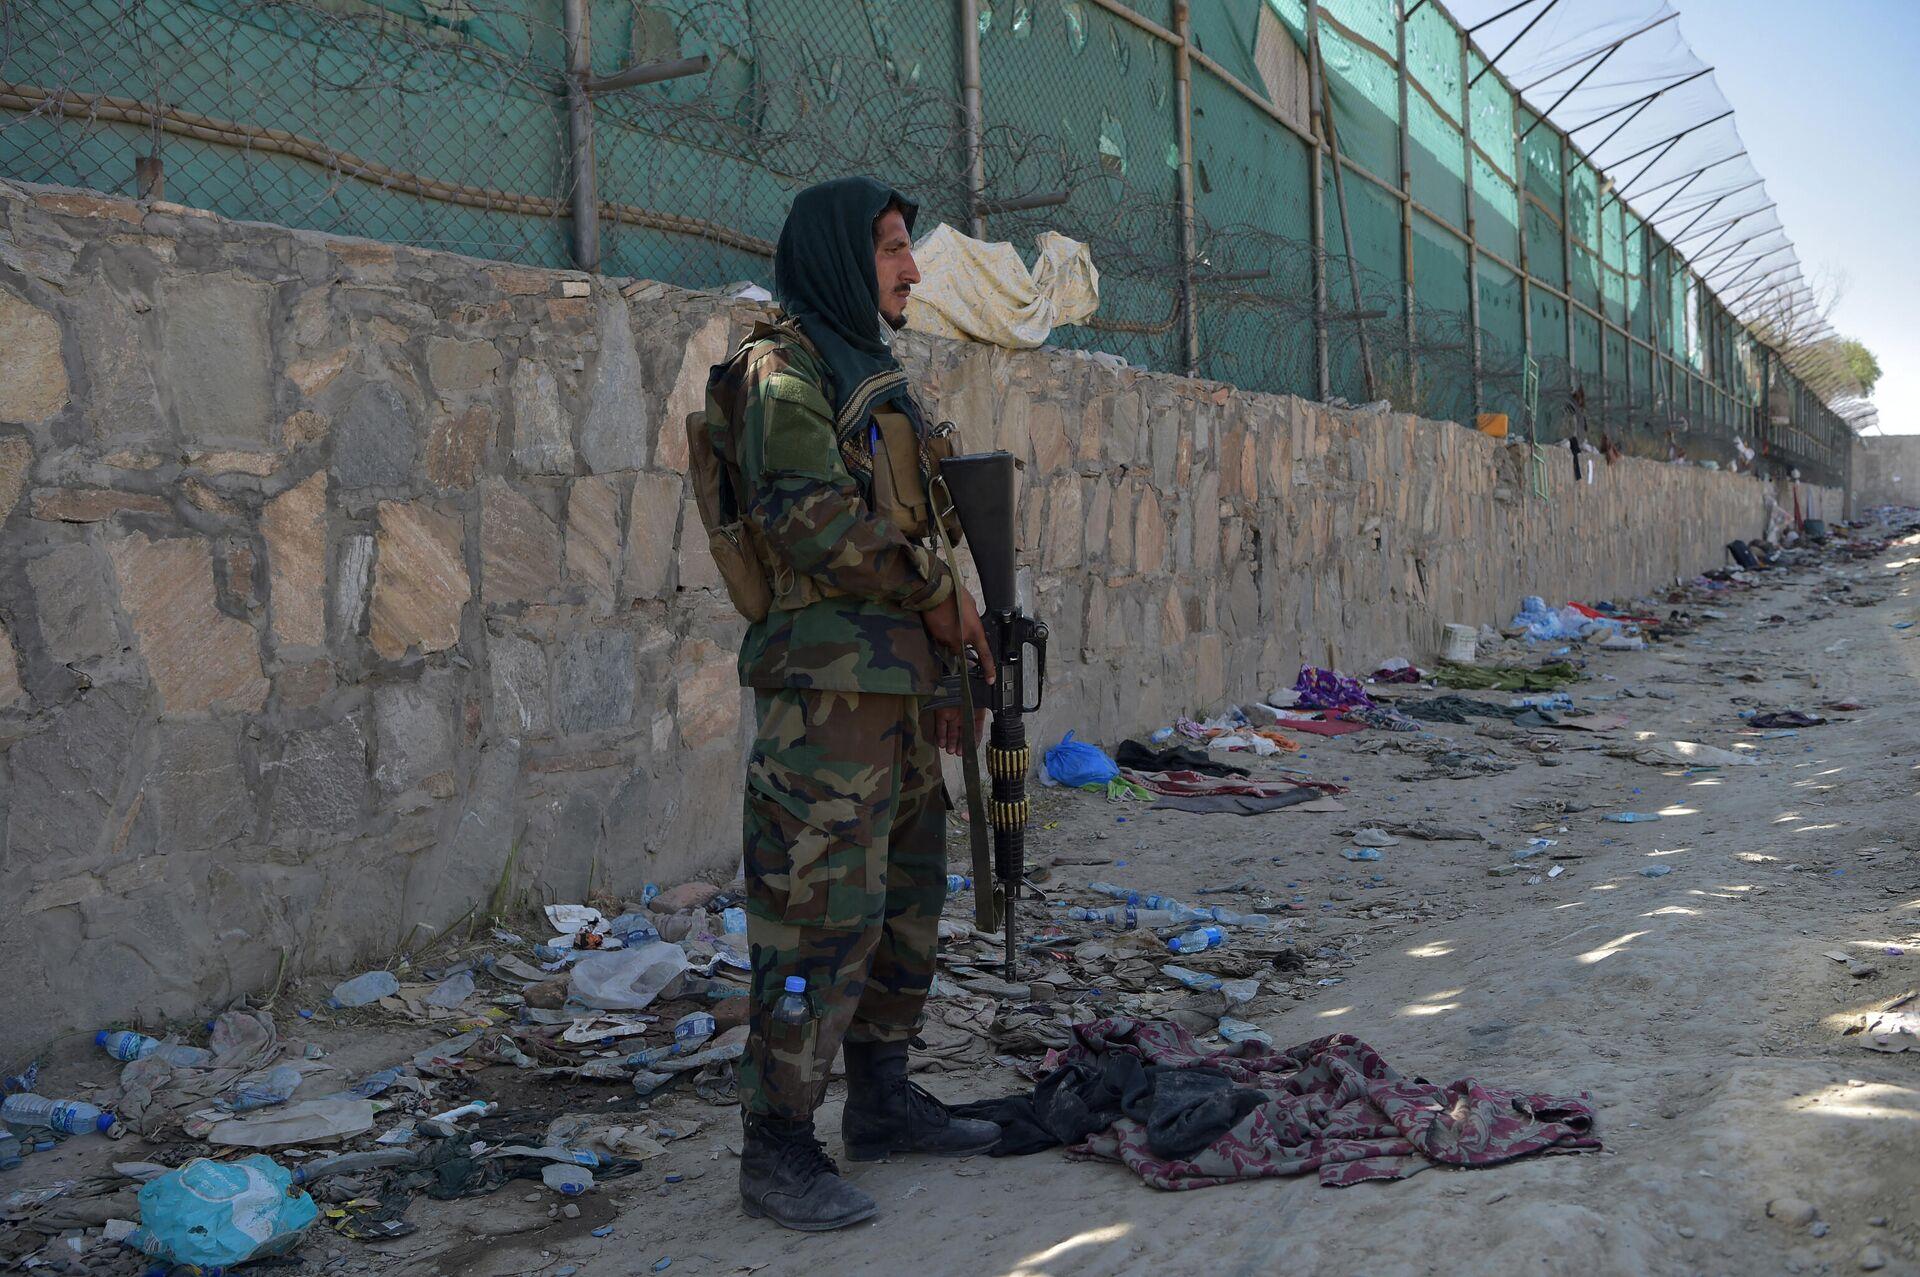 Боевик Талибана* на месте взрыва возле аэропорта Кабула - Sputnik Latvija, 1920, 01.09.2021